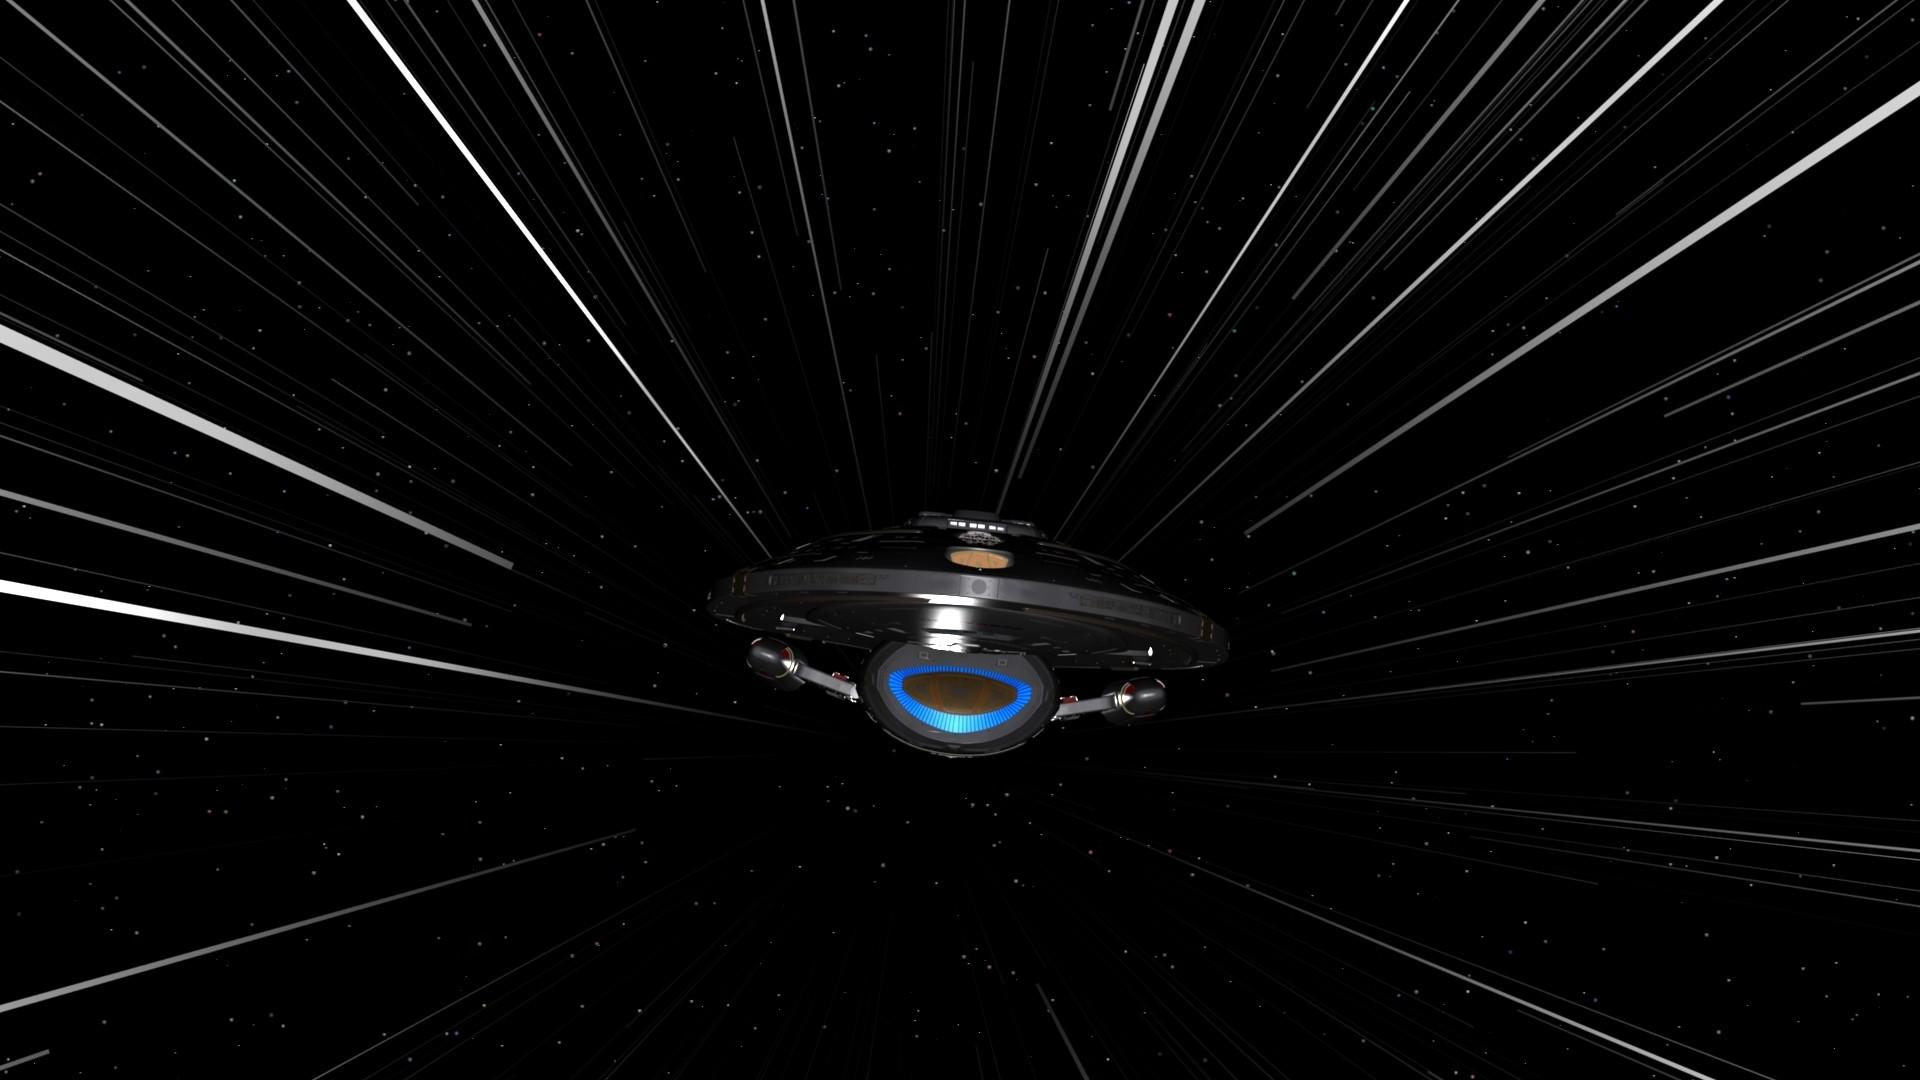 Star Trek Ship Wallpapers: Star Trek Voyager Wallpapers (69+ Images